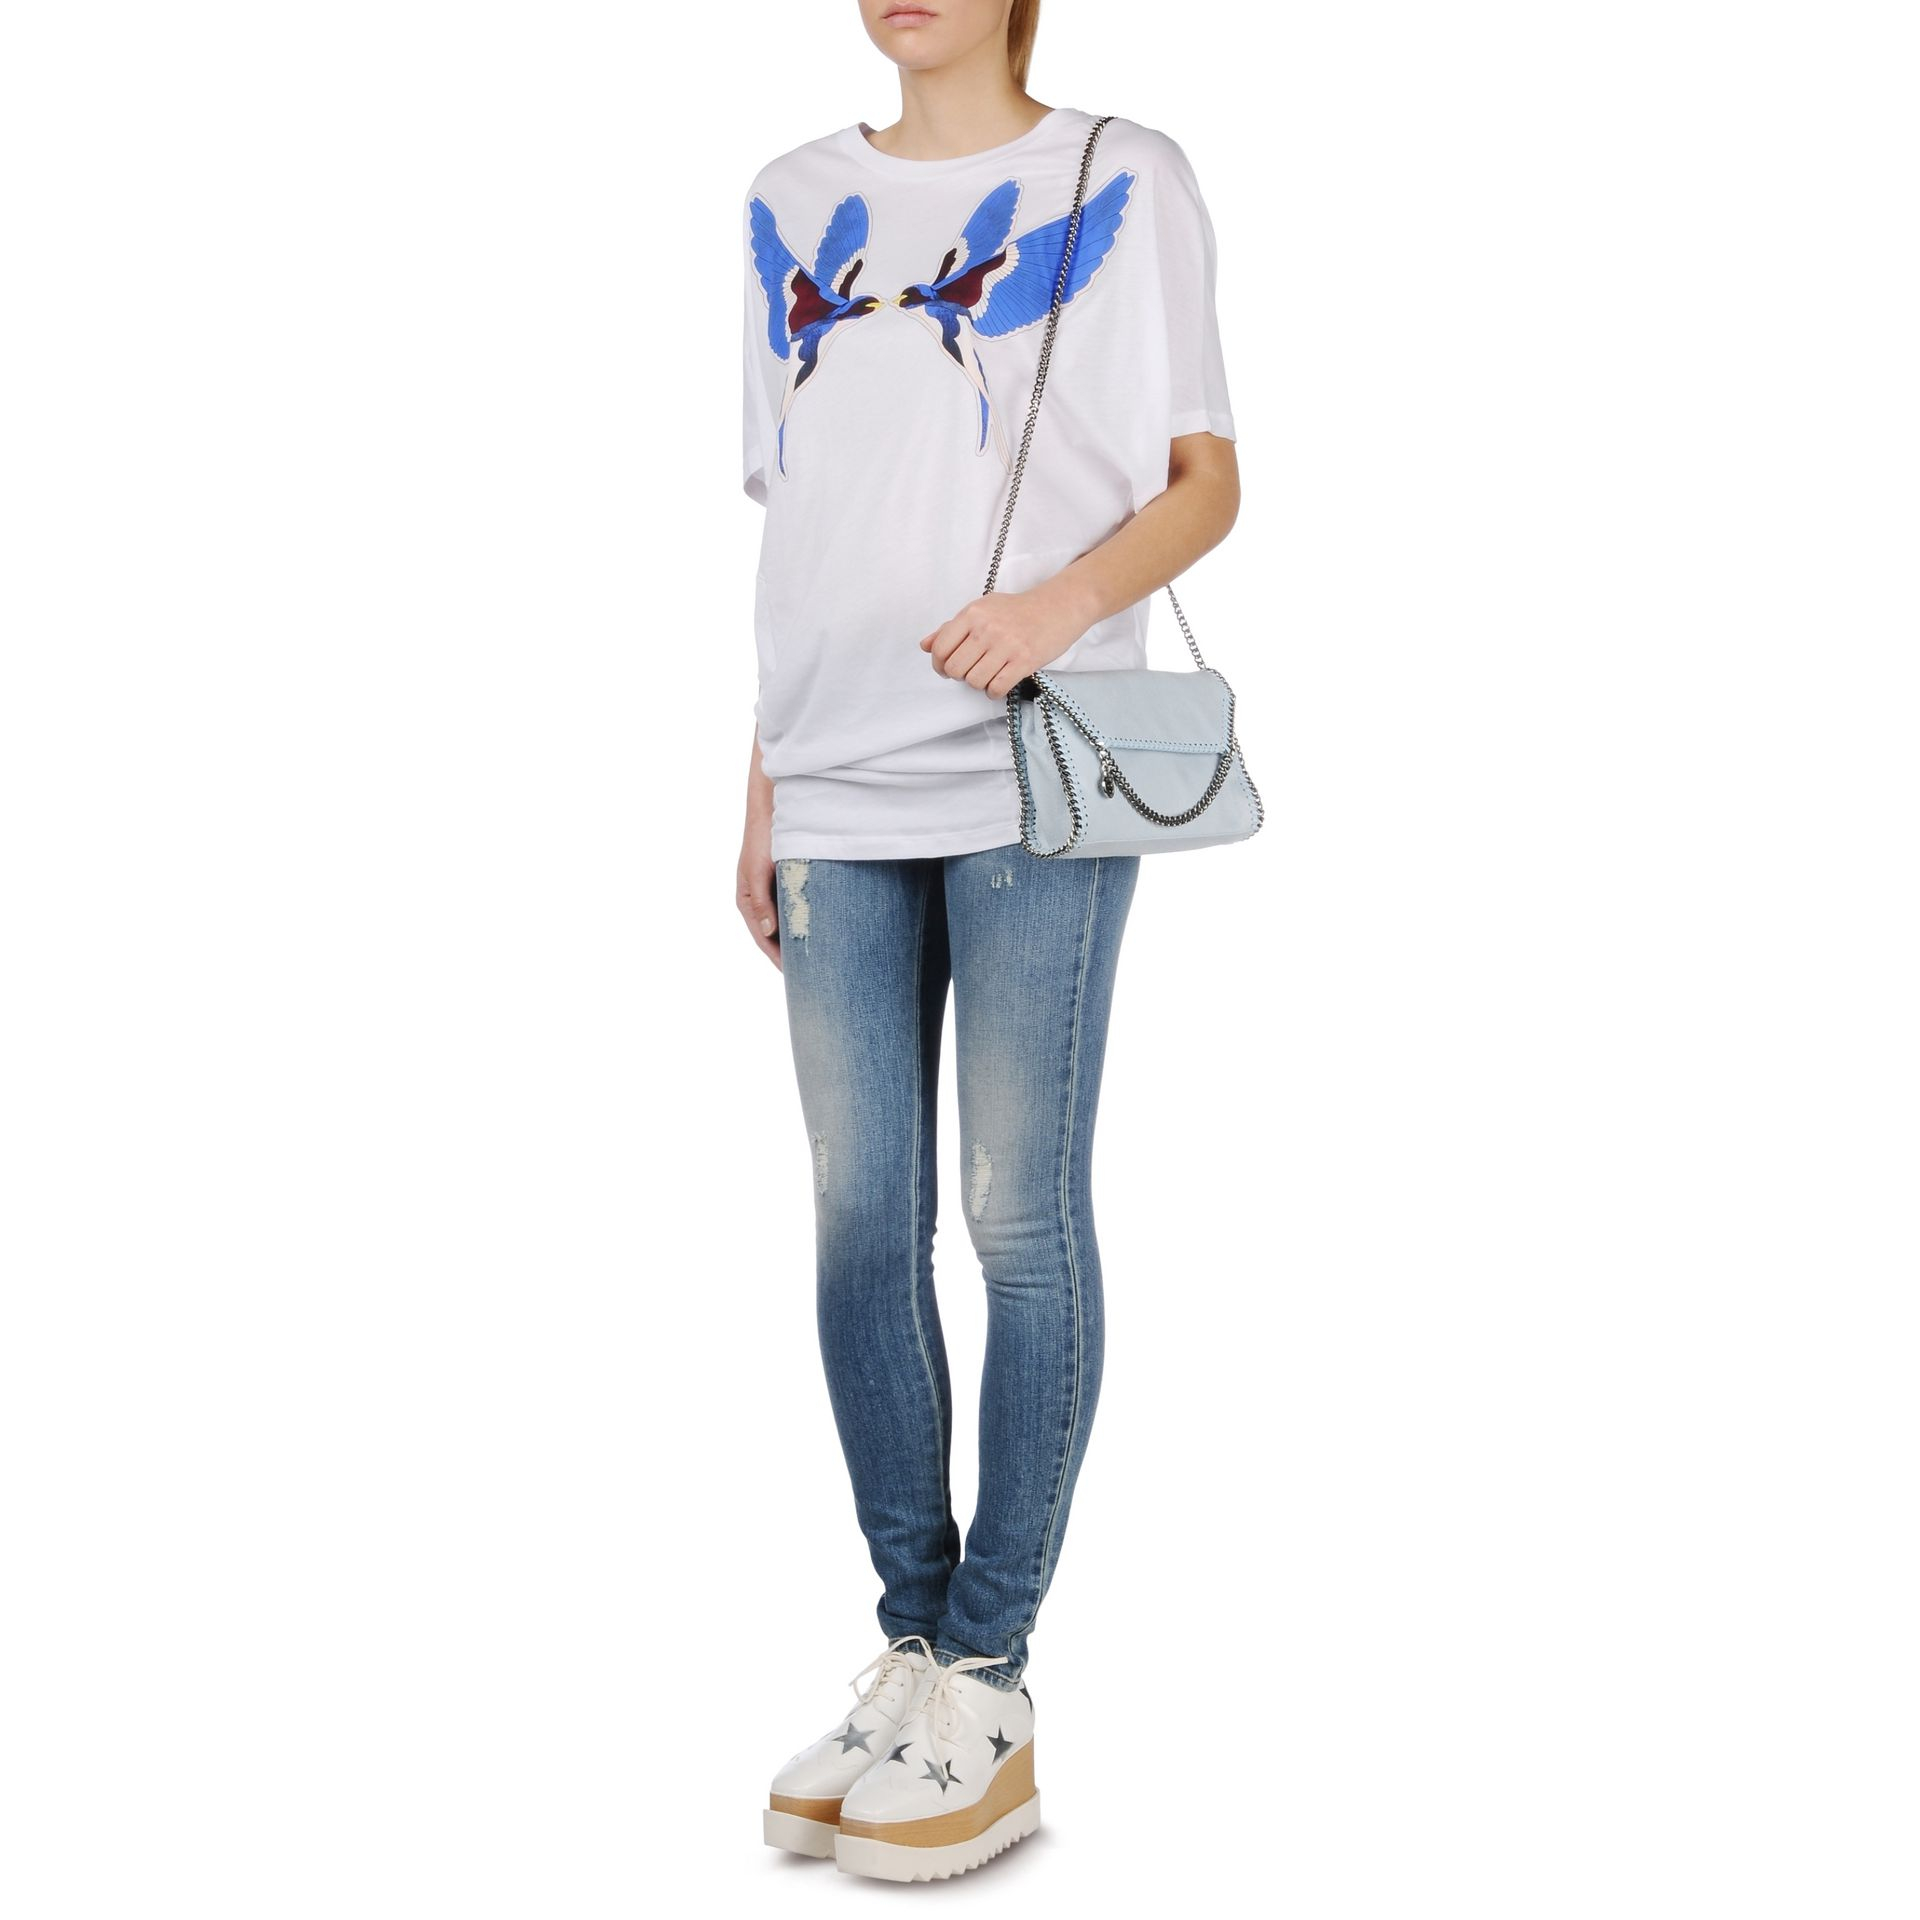 38df4305d262 Lyst - Stella McCartney Falabella Shaggy Deer Mini Bag in White